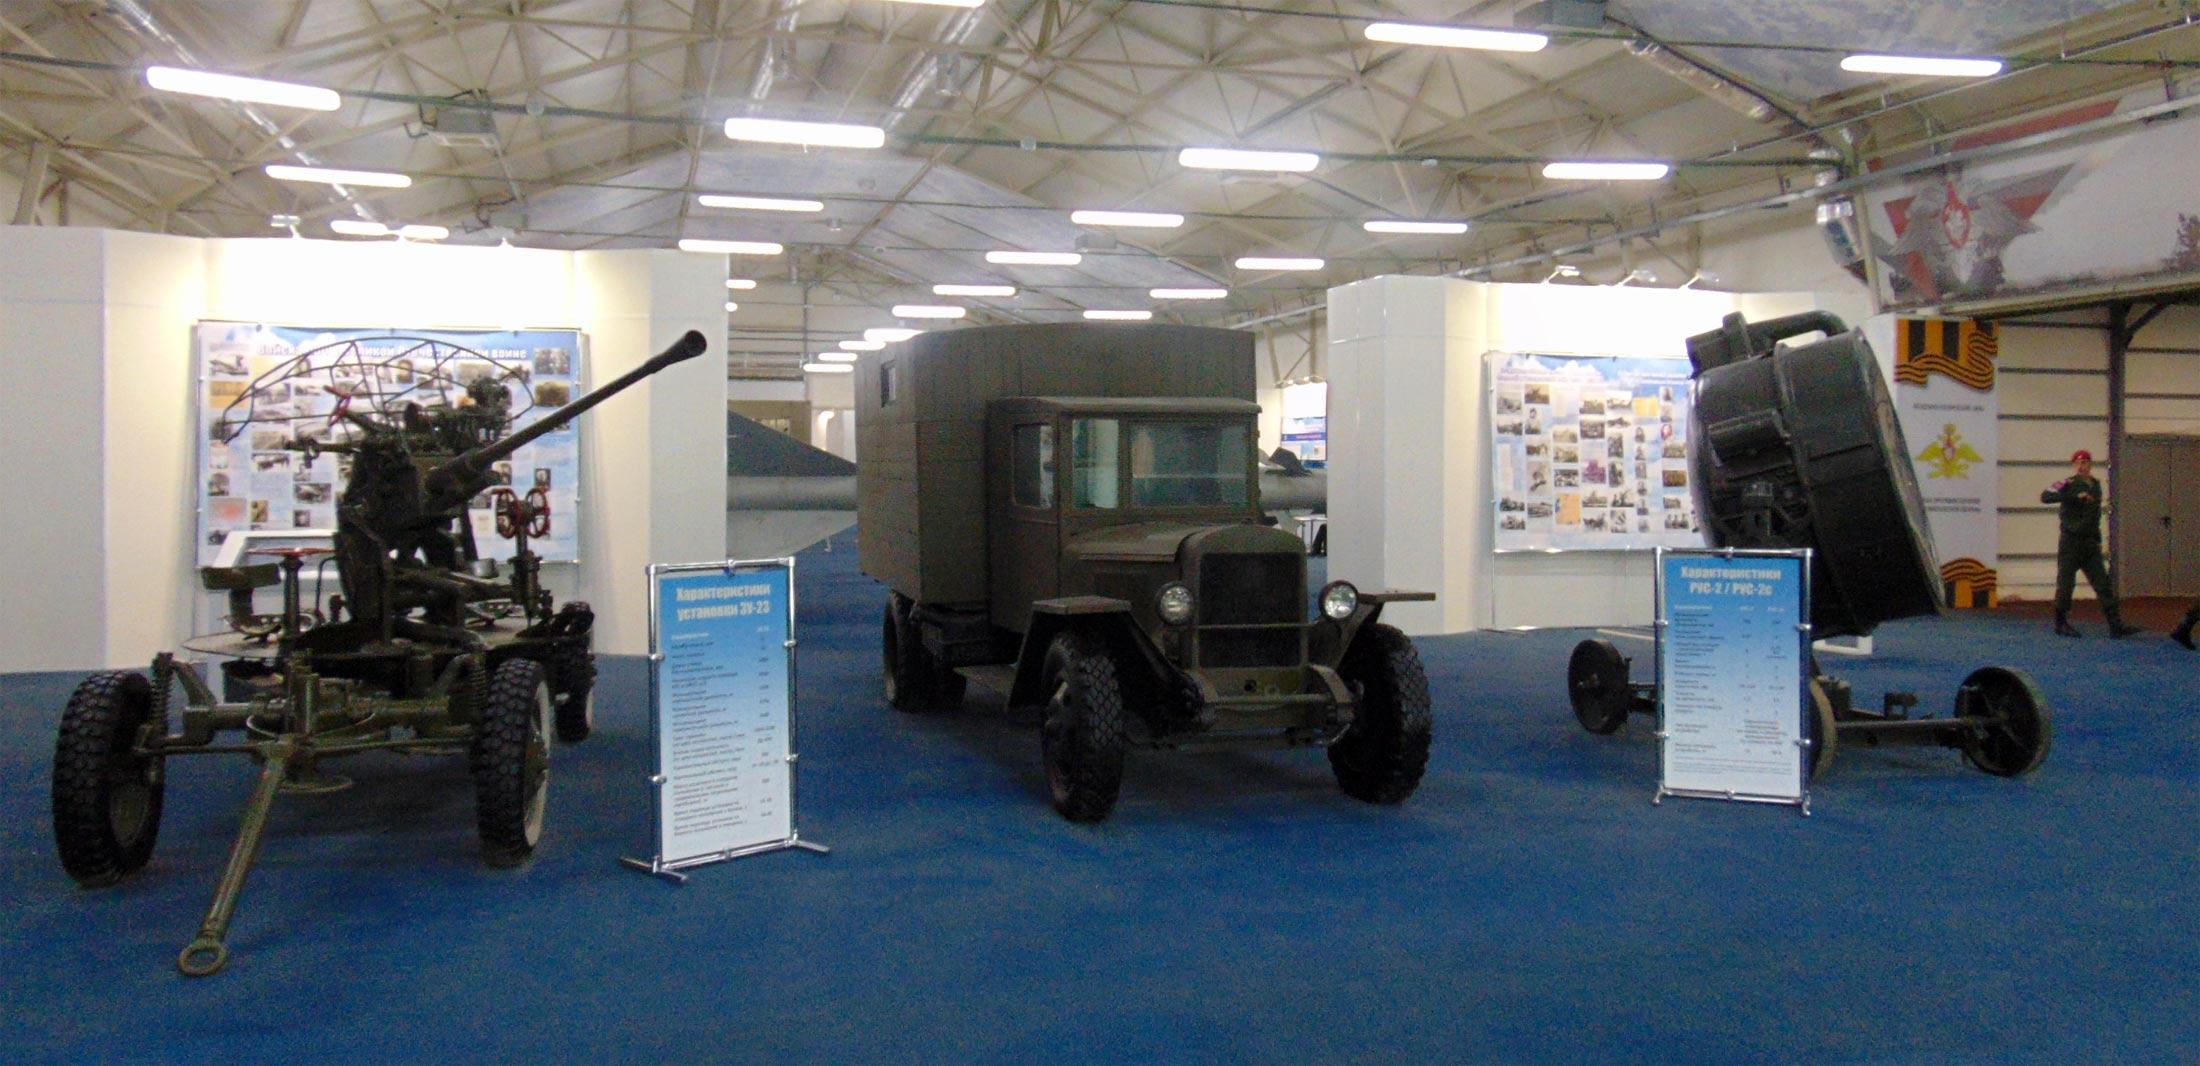 Kubinka Patriot park WWII ainti-aircraft exhibits